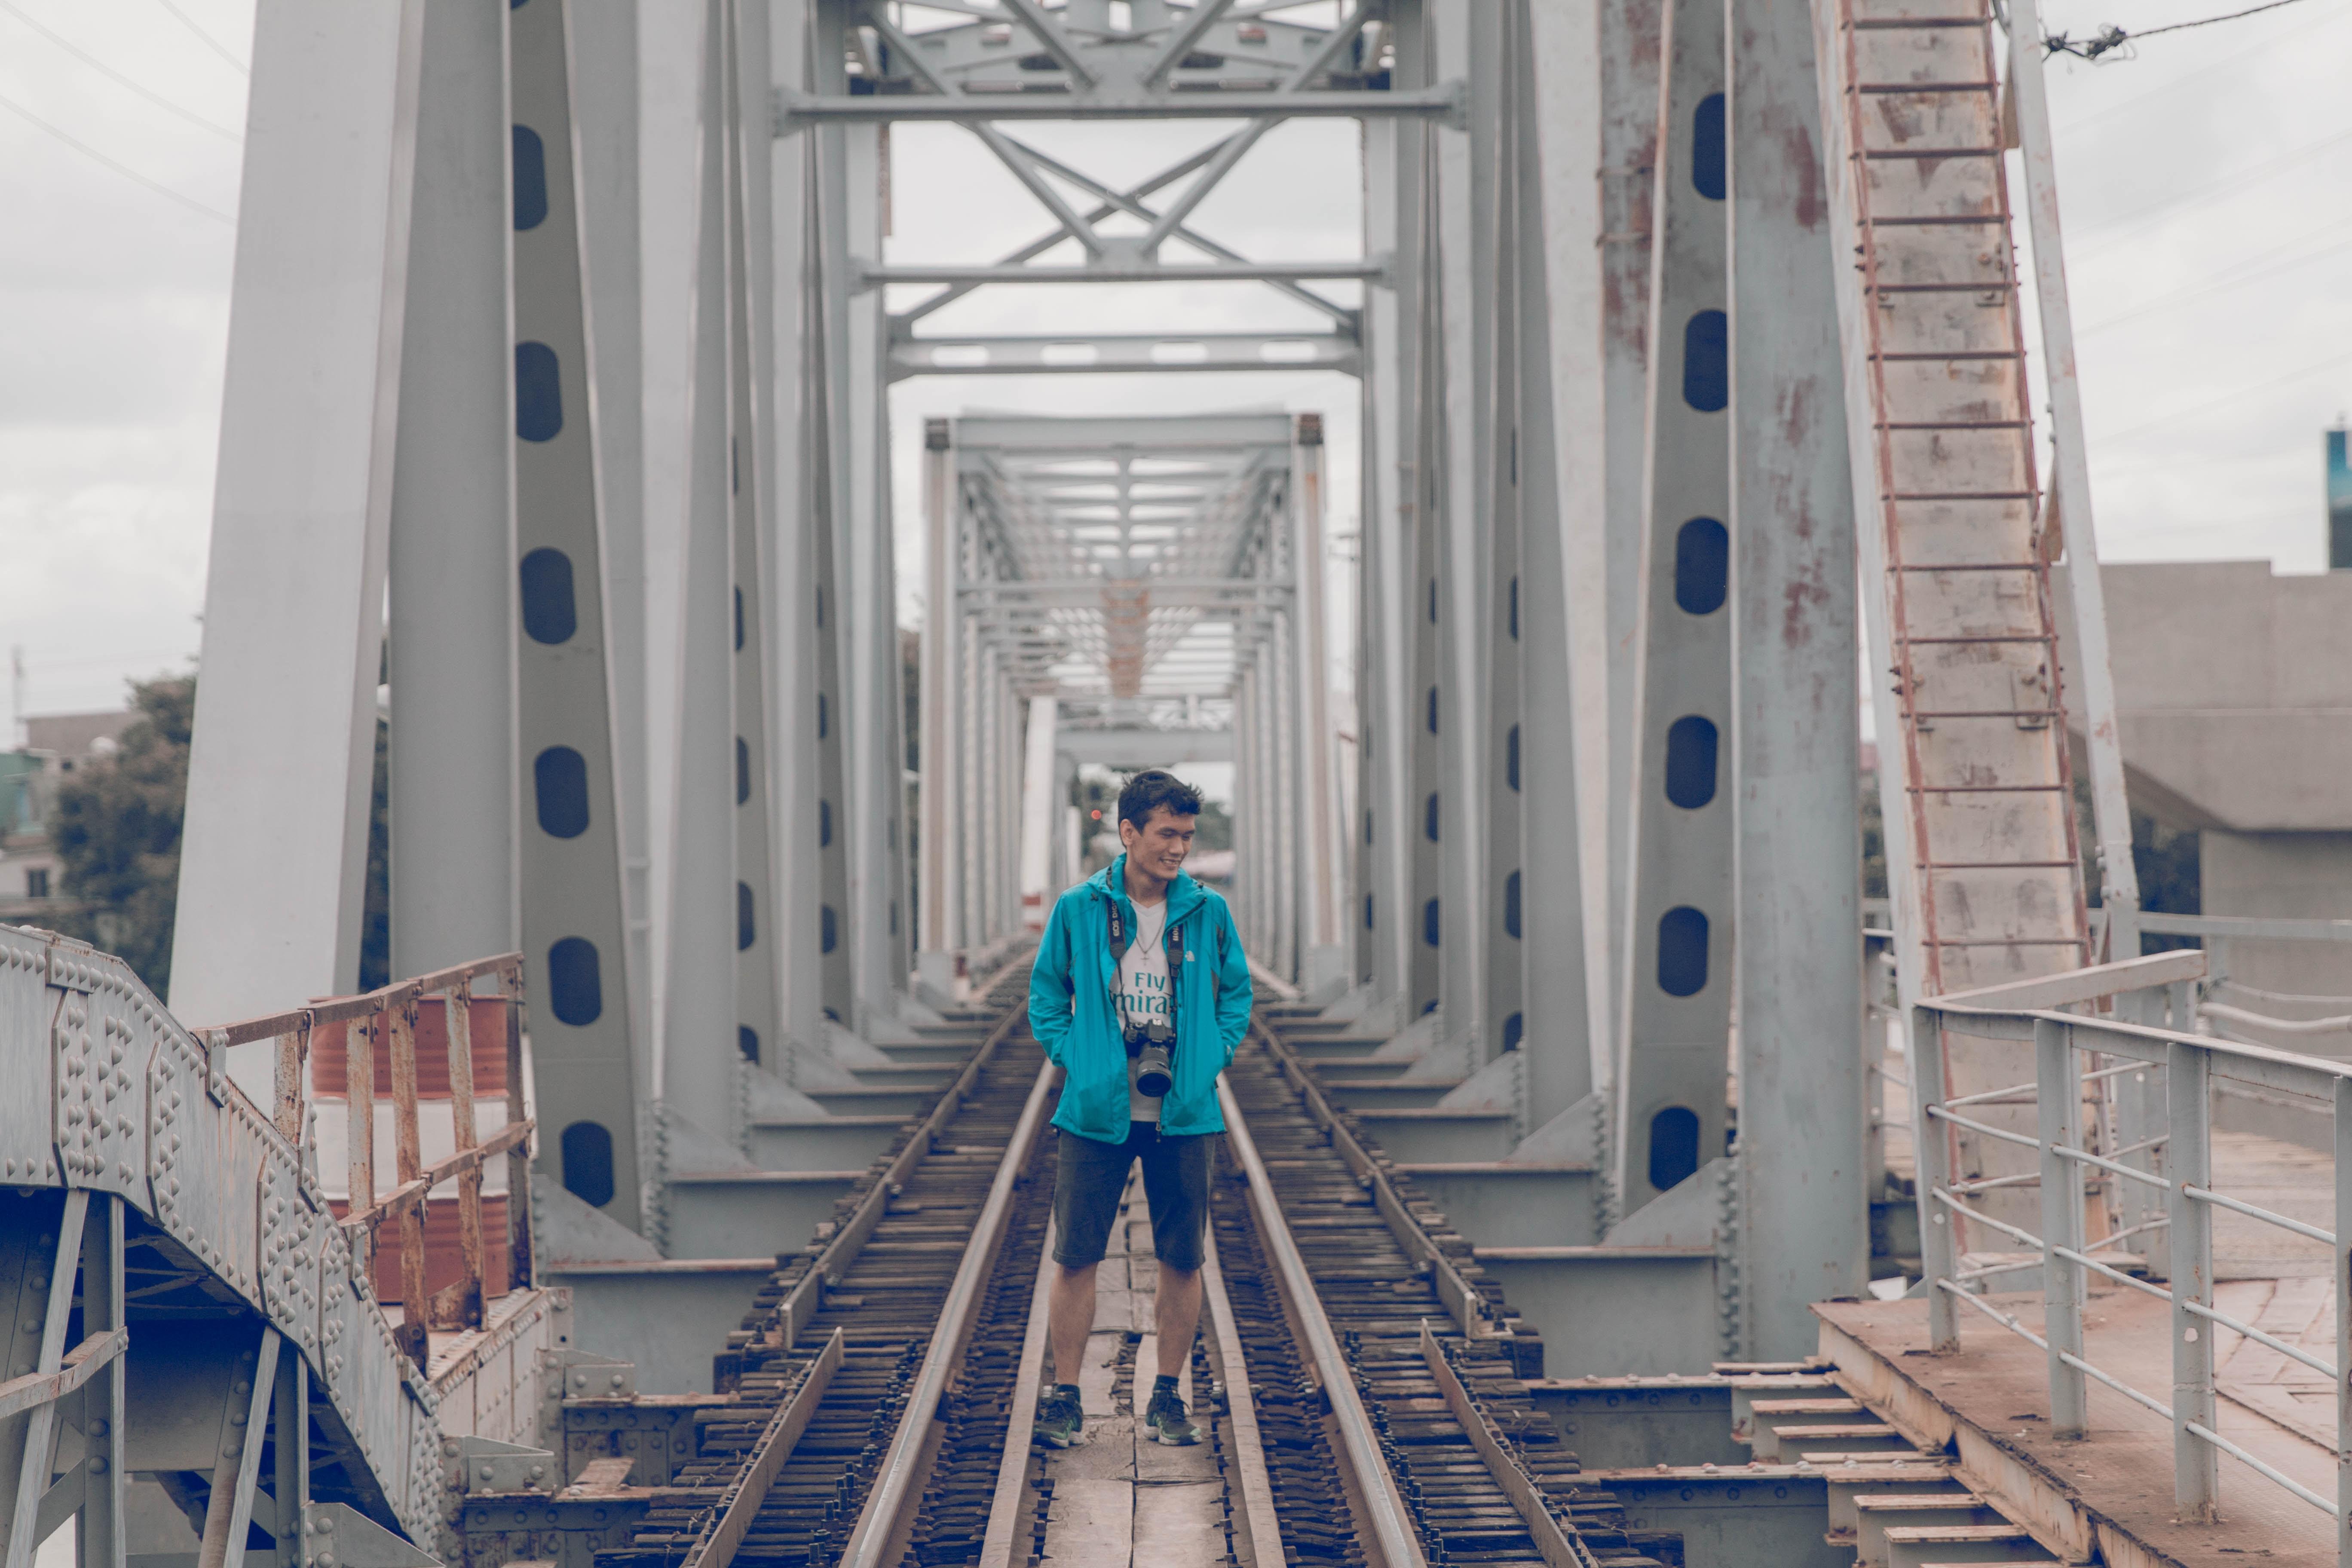 man wearing jacket standing on gray train bridge